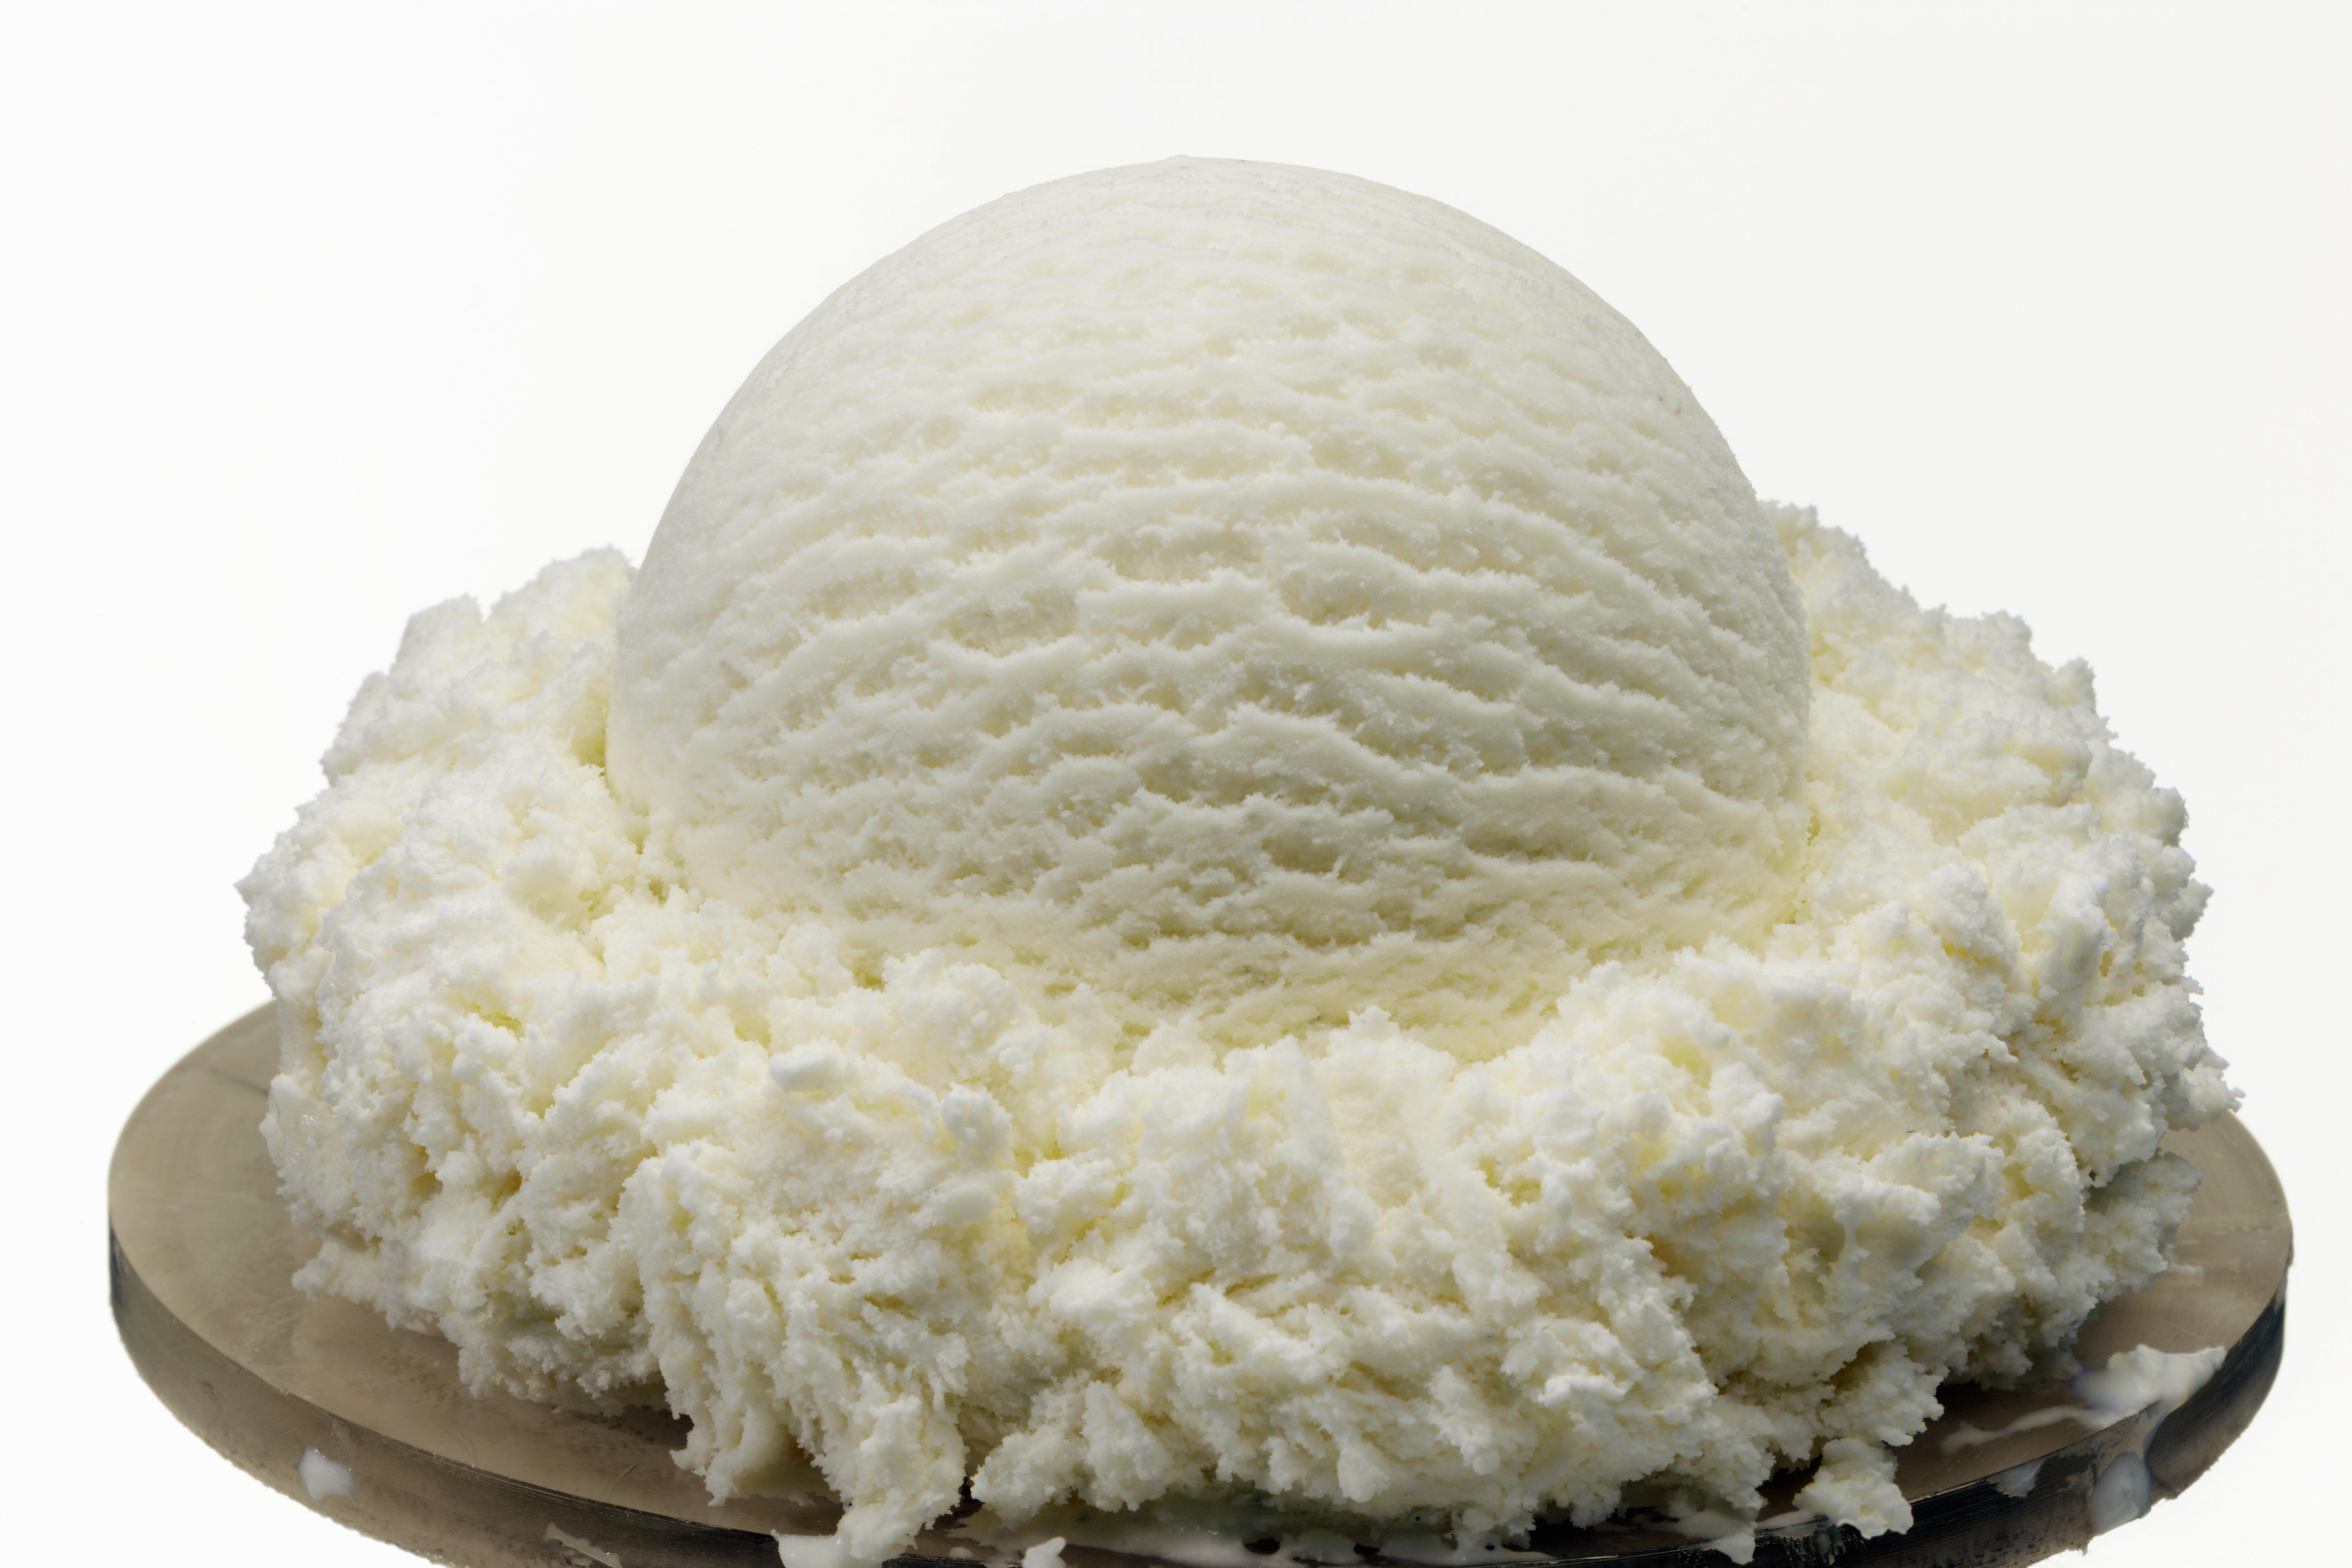 Food Network Ice Cream Scoop